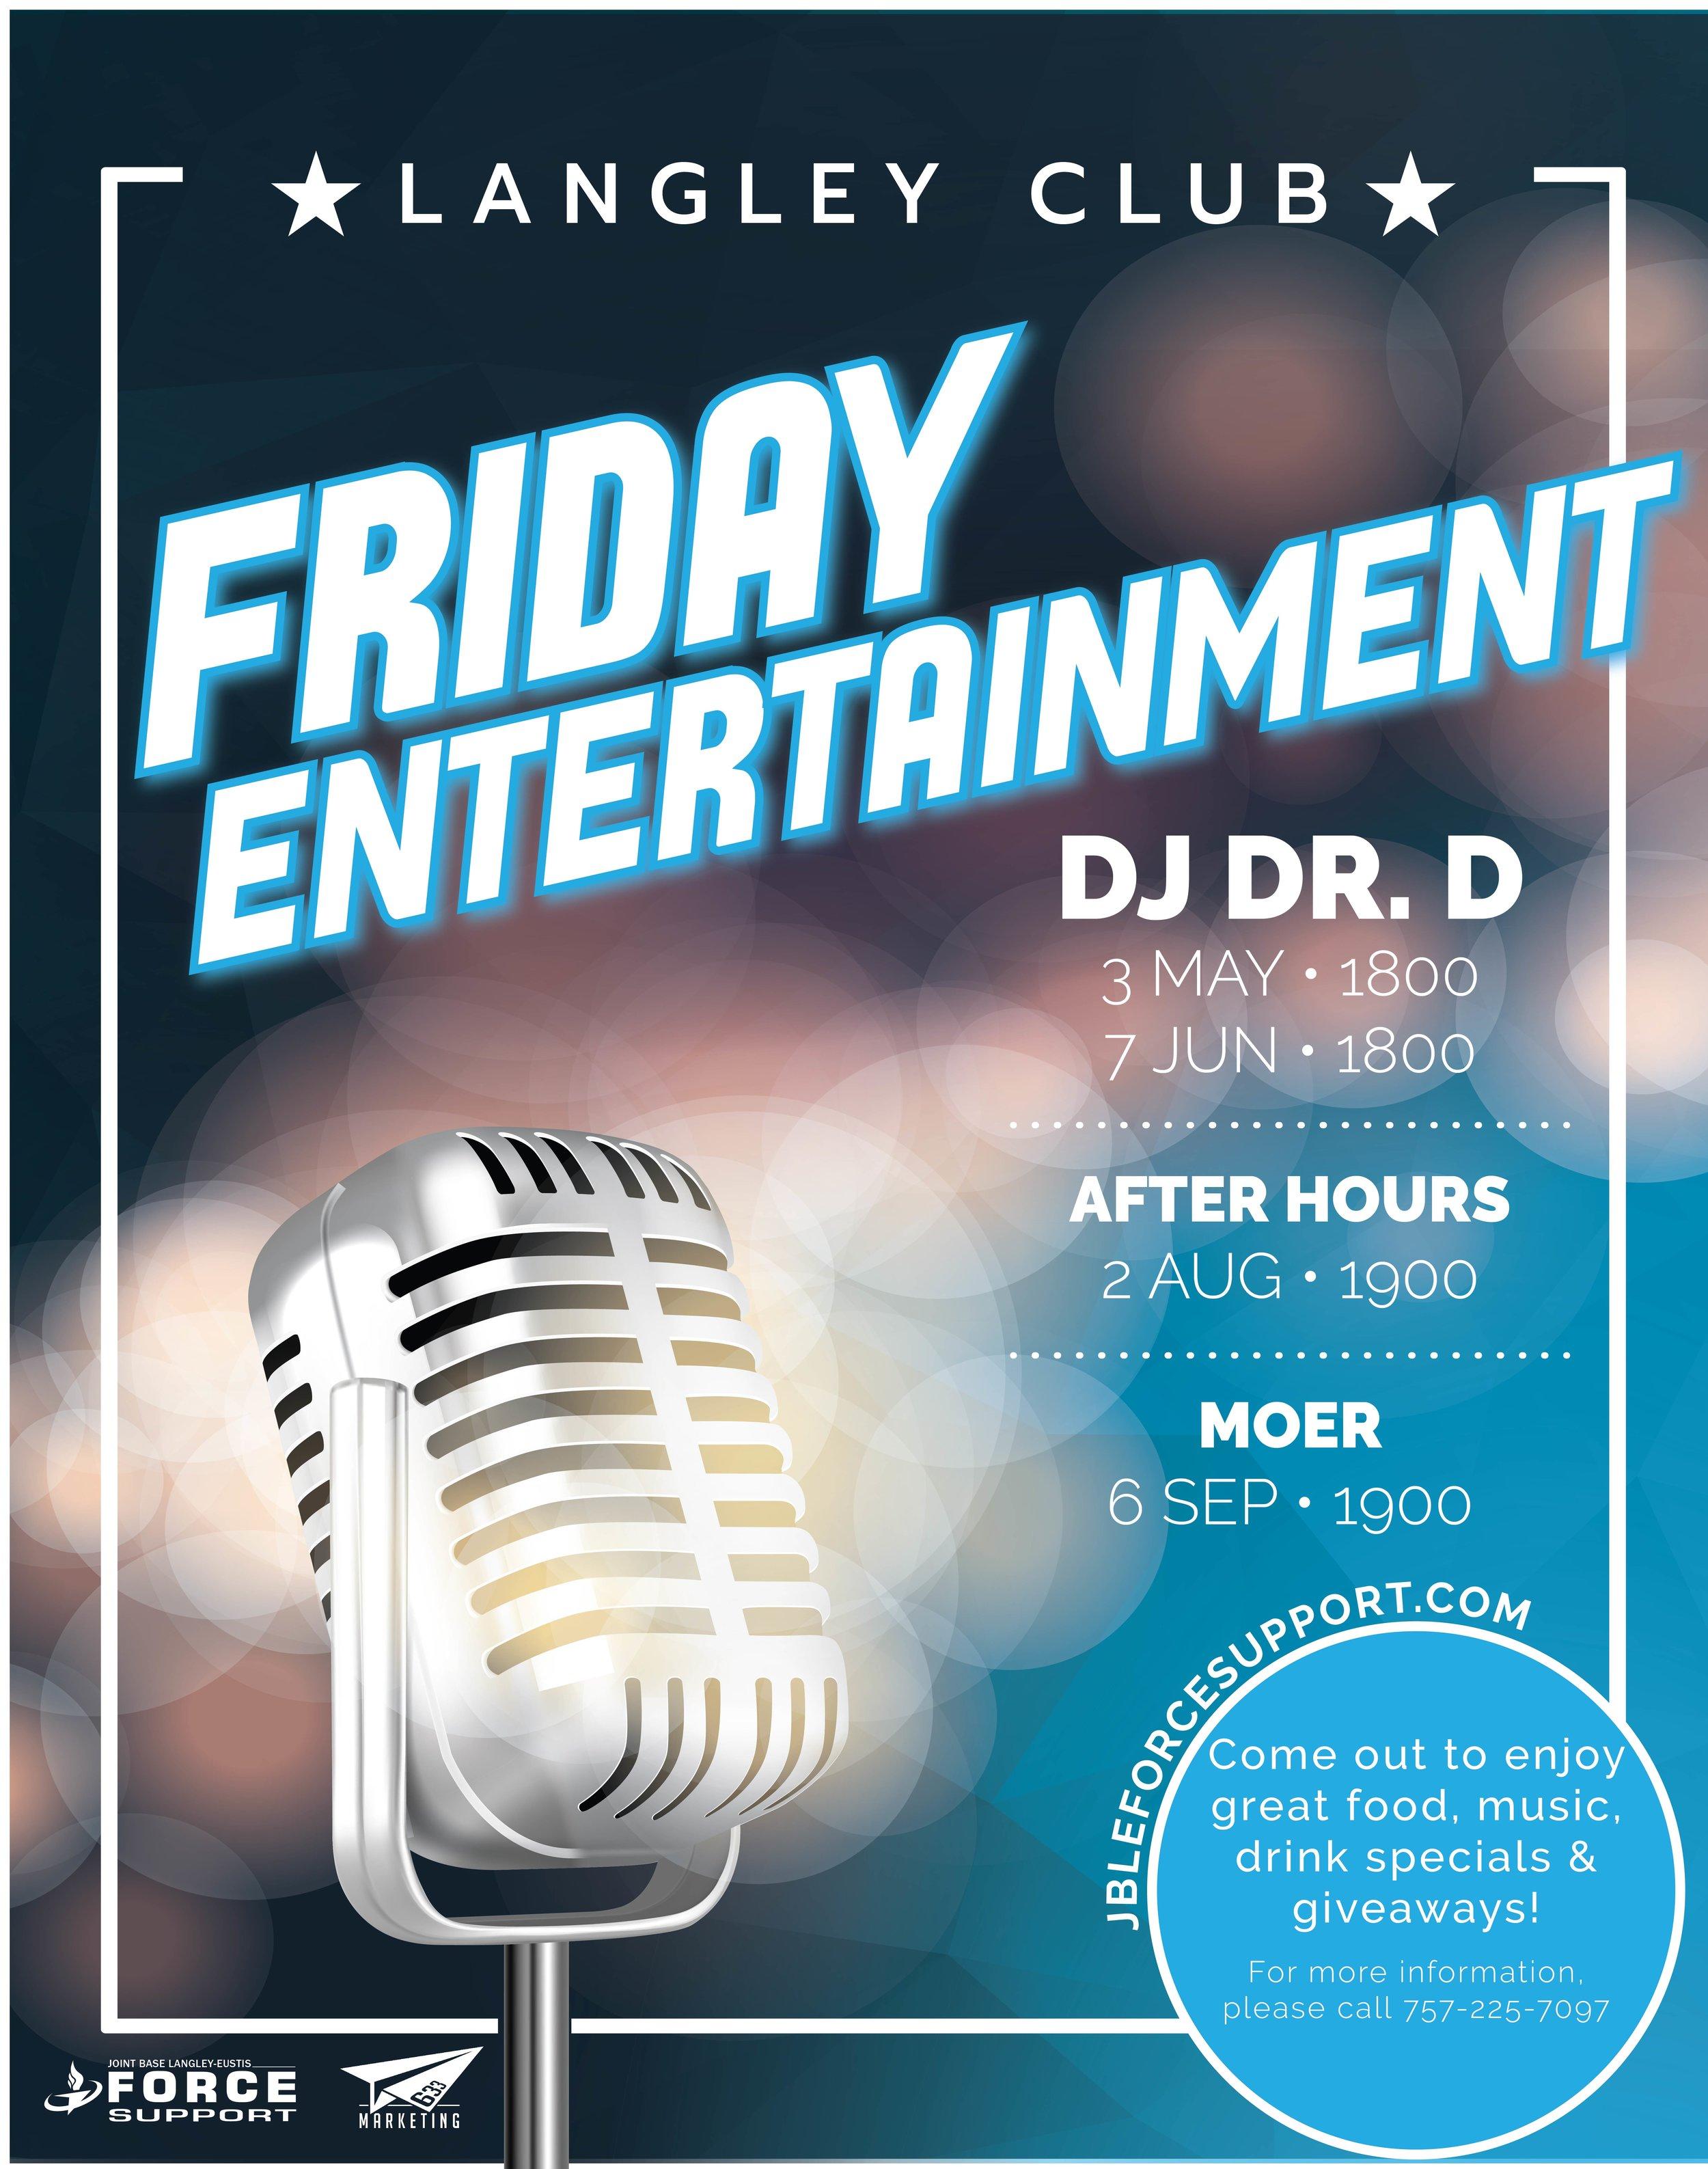 04-19 Friday Entertainment Poster.jpg